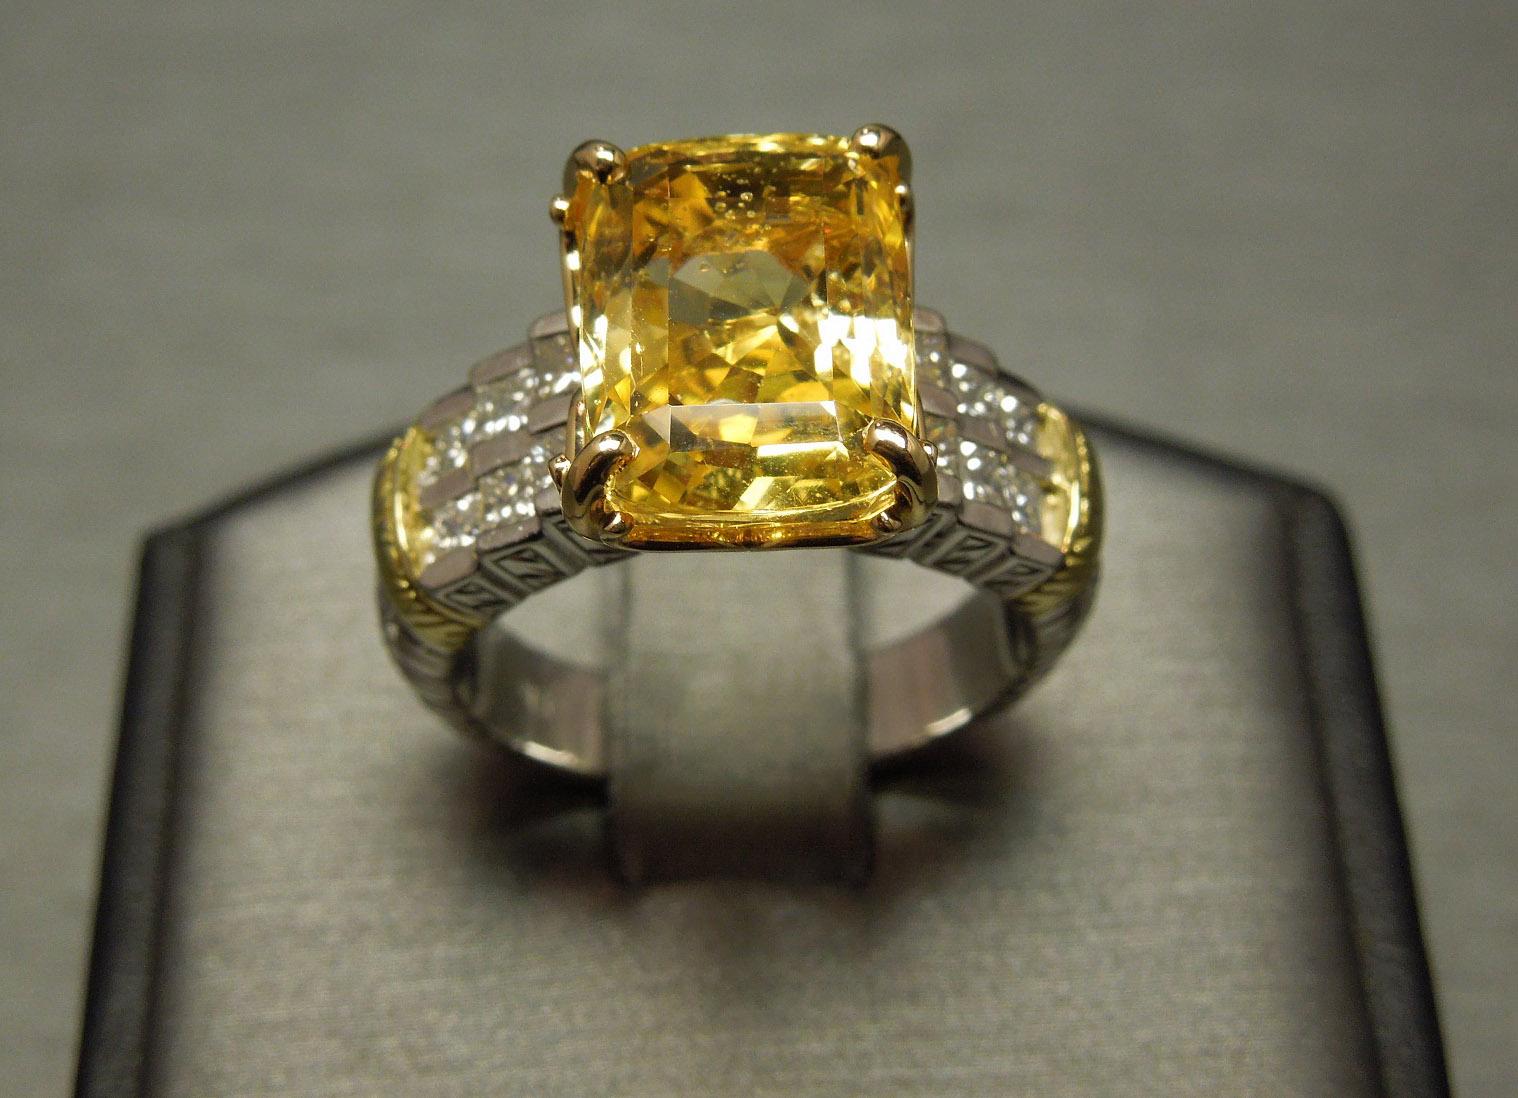 Gia Natural Yellow Sapphire Ring 11 55 Tcw Plat Amp 18k